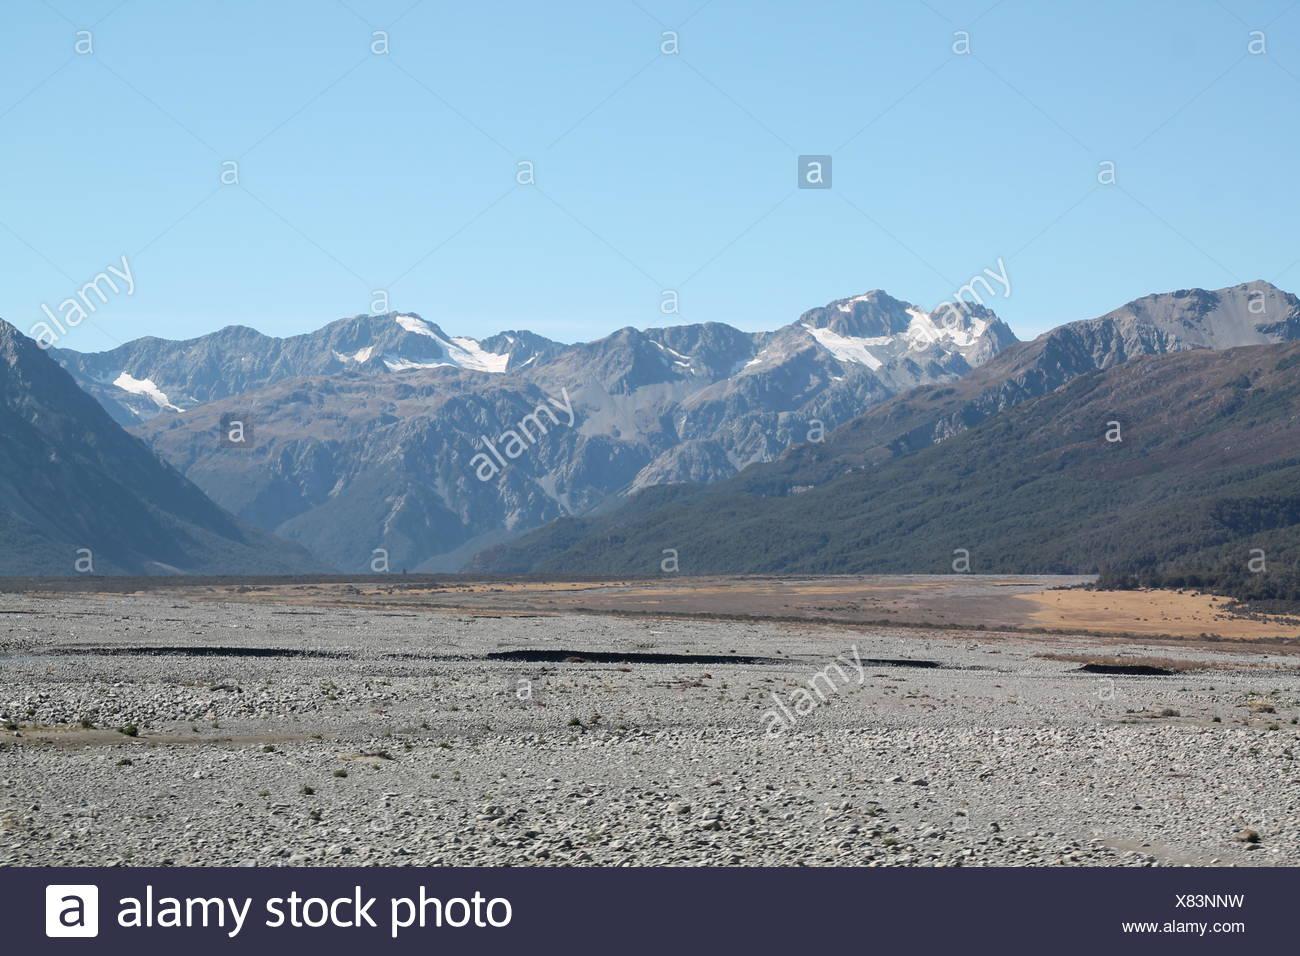 Arthur's Pass, New Zealand - Stock Image